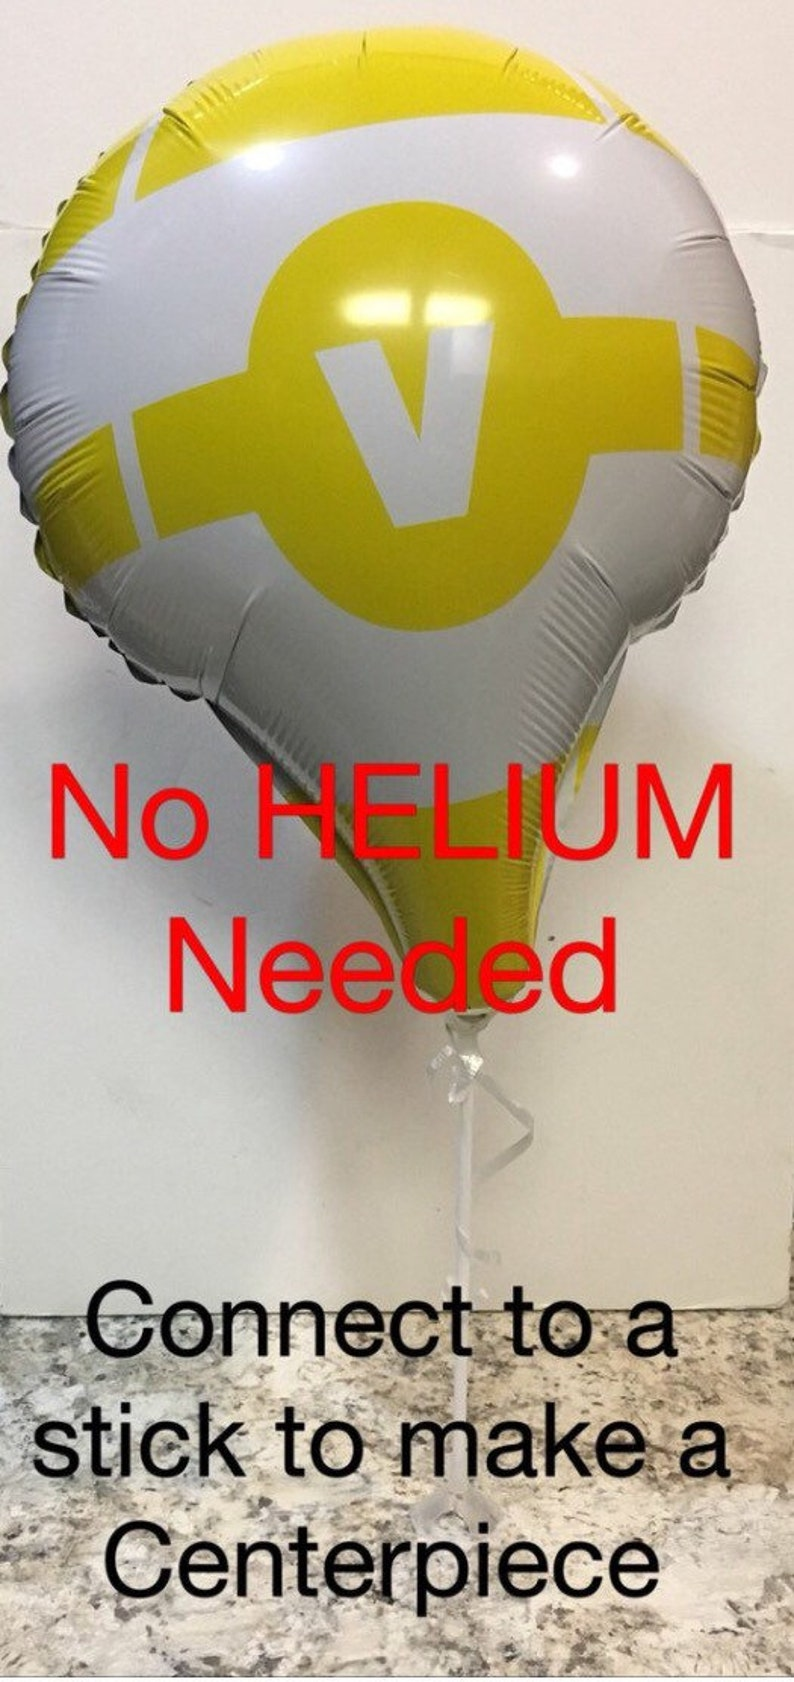 Fortnite Hot Air Balloon Fortnite Aimbot 2019 Ps4